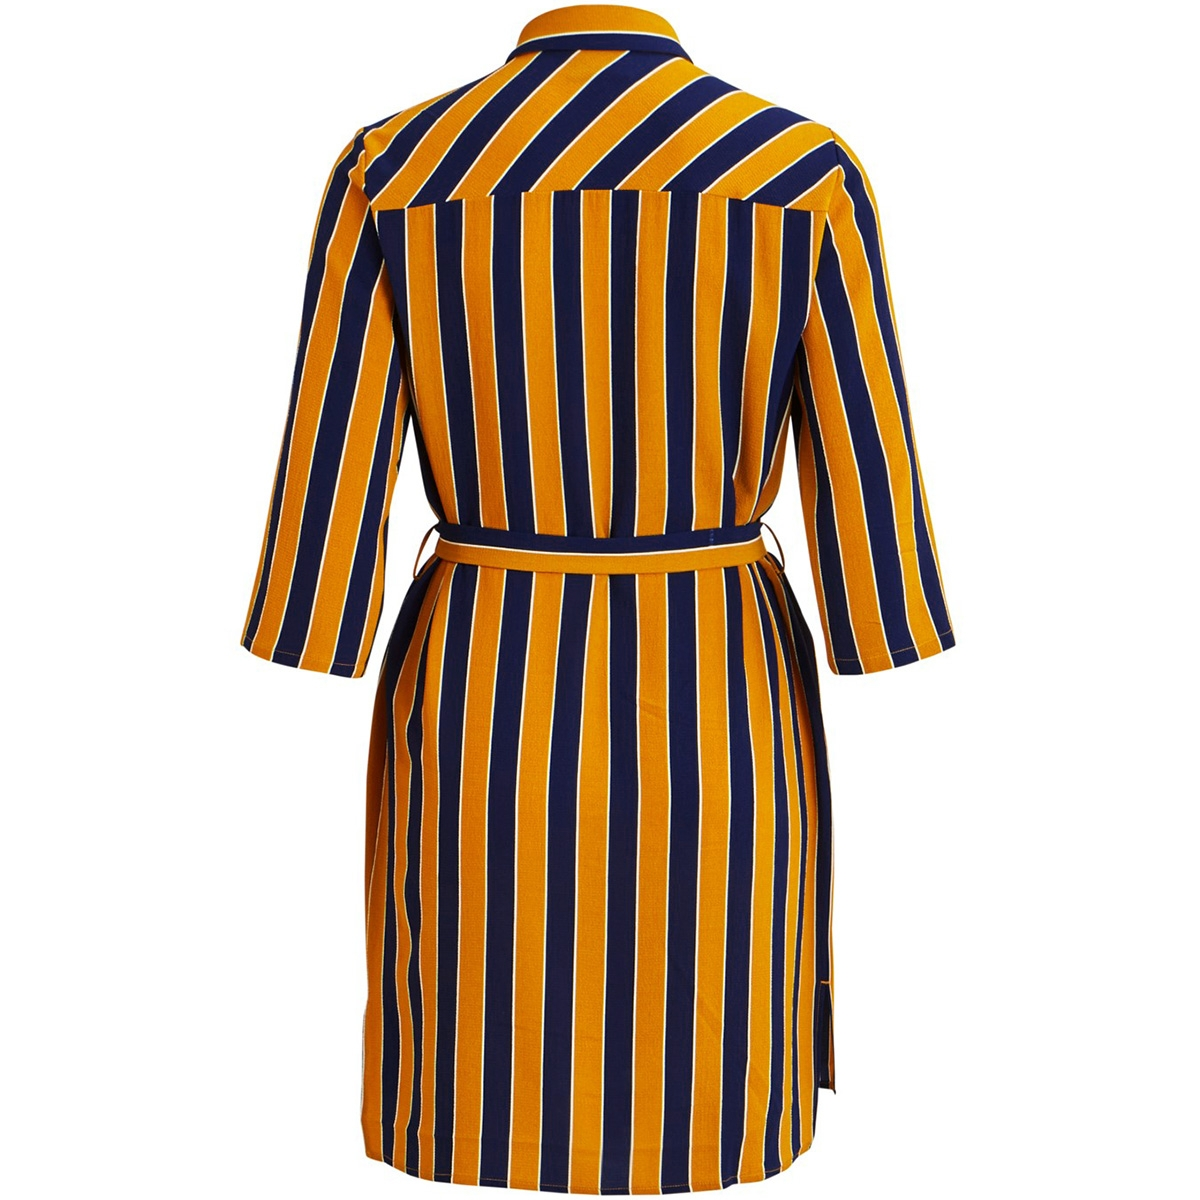 objlia tess 3/4 shirt dress pb6 23029711 object jurk buckthorn brown/striped